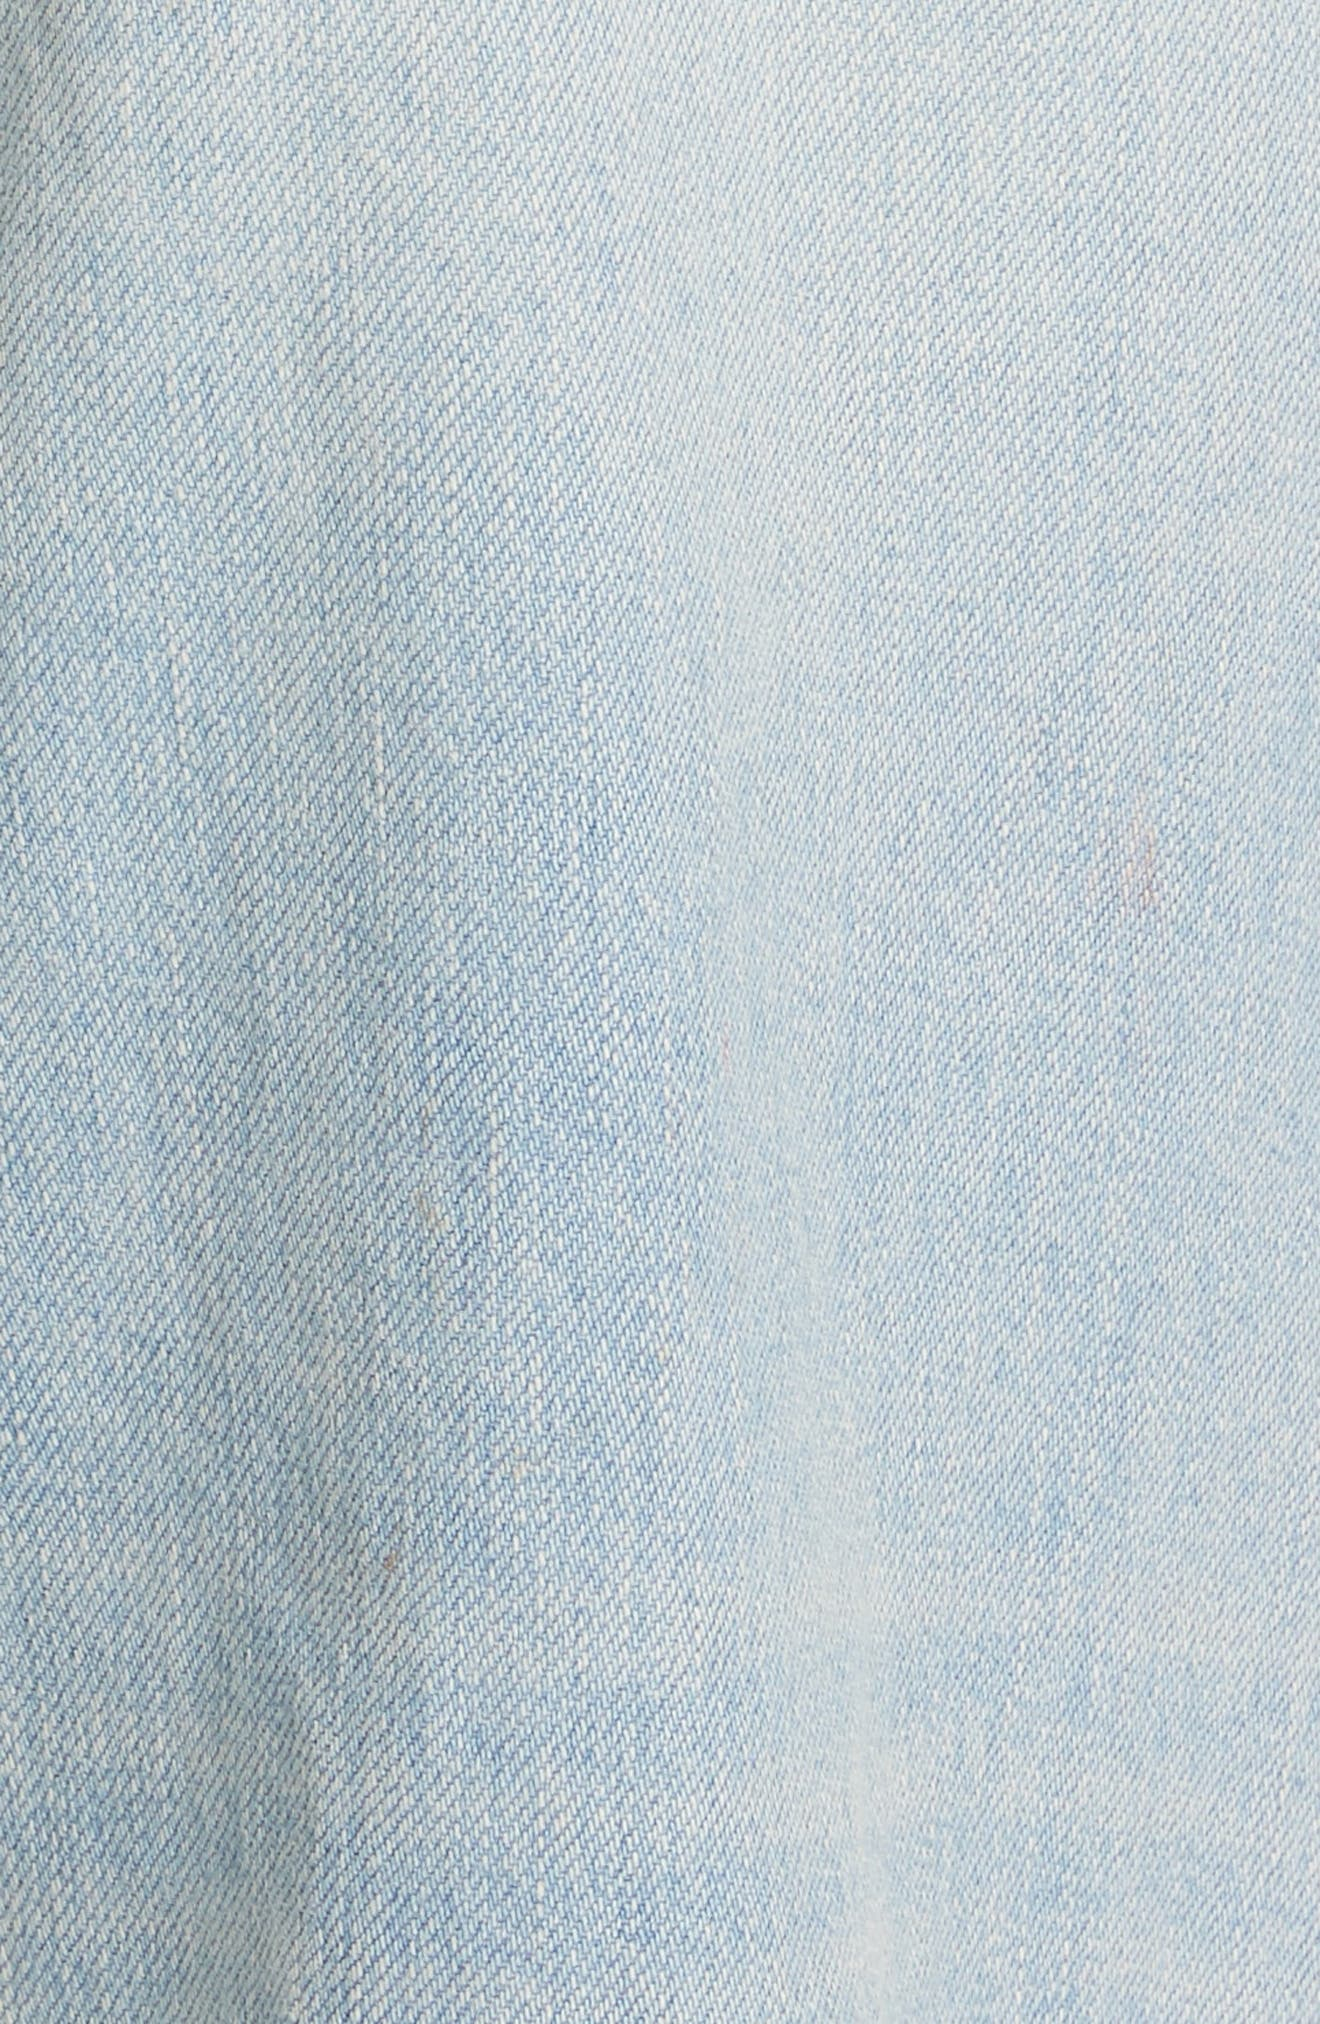 High Waist Crop Jeans,                             Alternate thumbnail 5, color,                             VINTAGE WASH 6